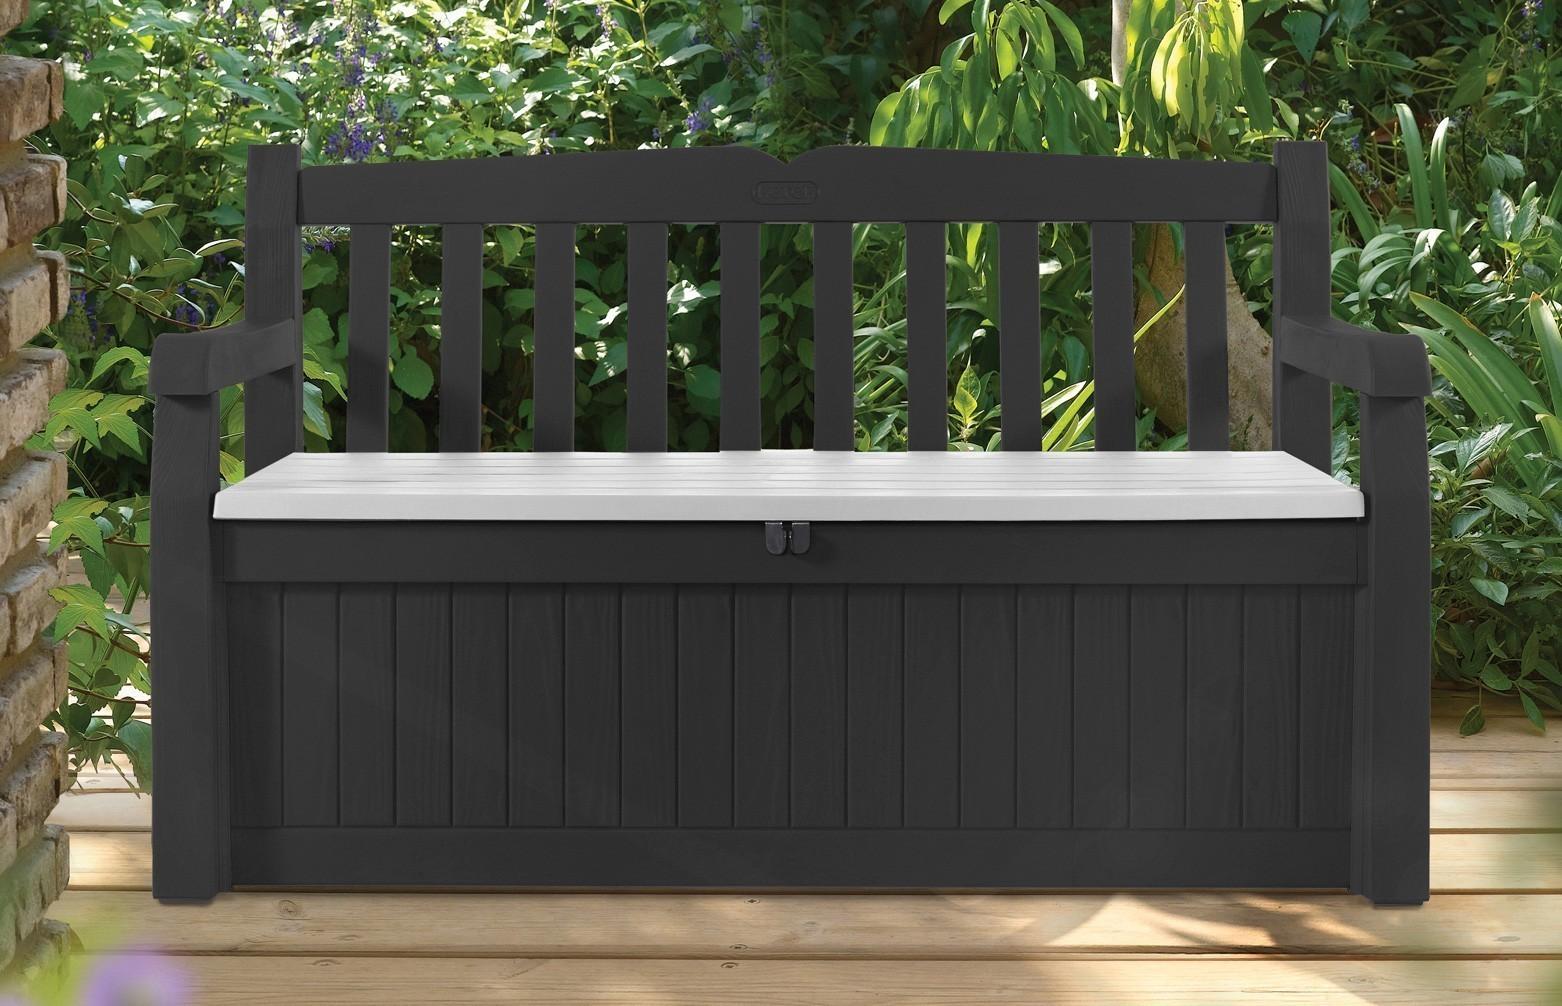 gartenbank modern grau. Black Bedroom Furniture Sets. Home Design Ideas